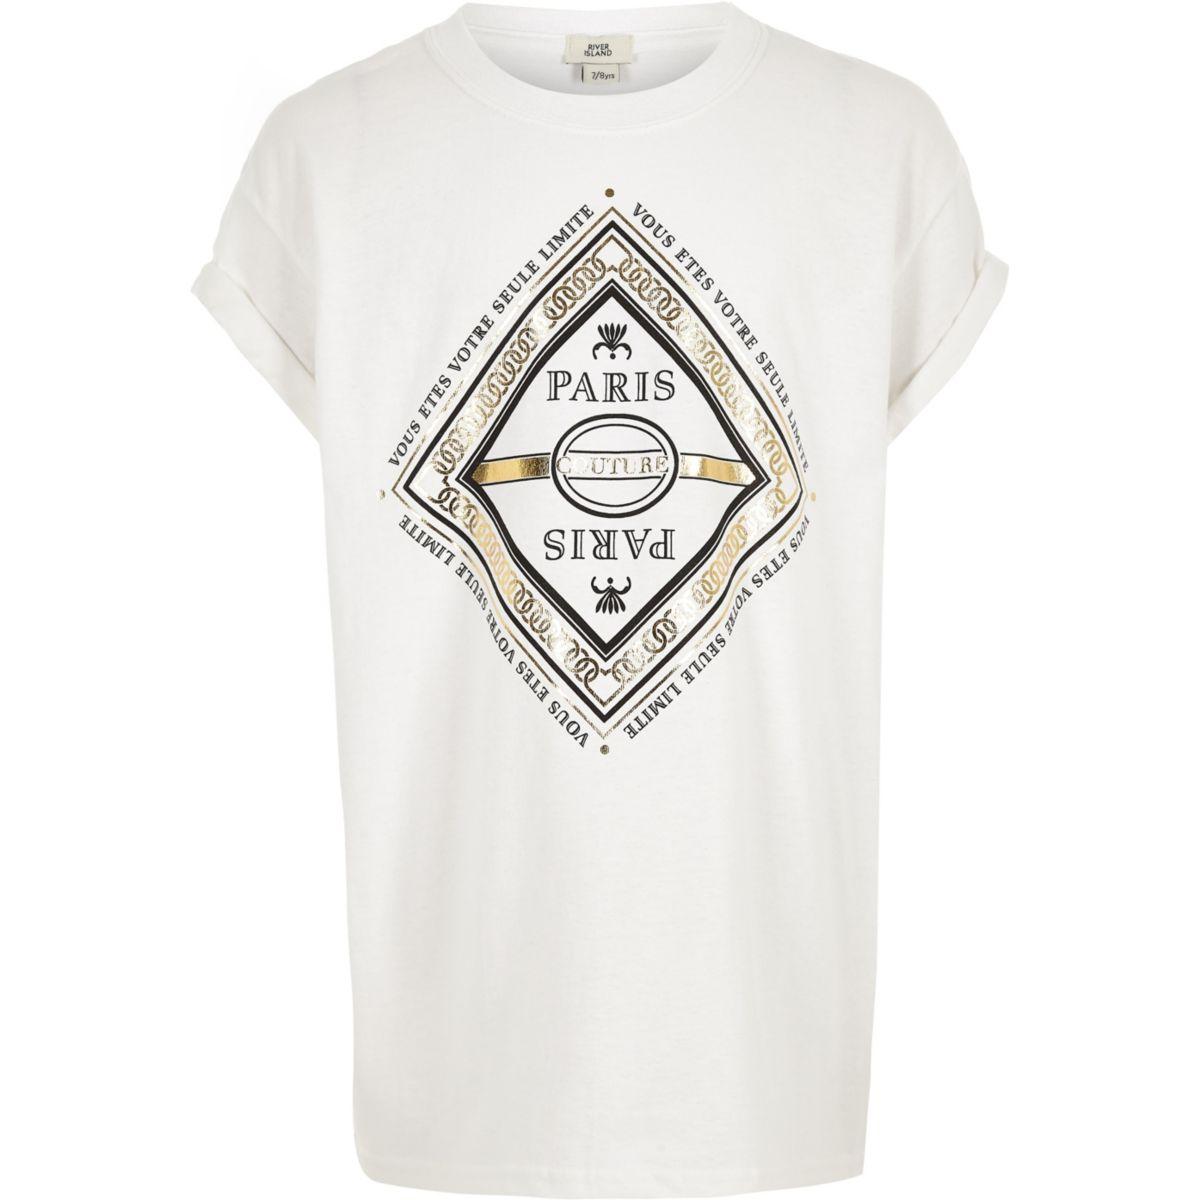 Girls white 'Paris' foil print T-shirt